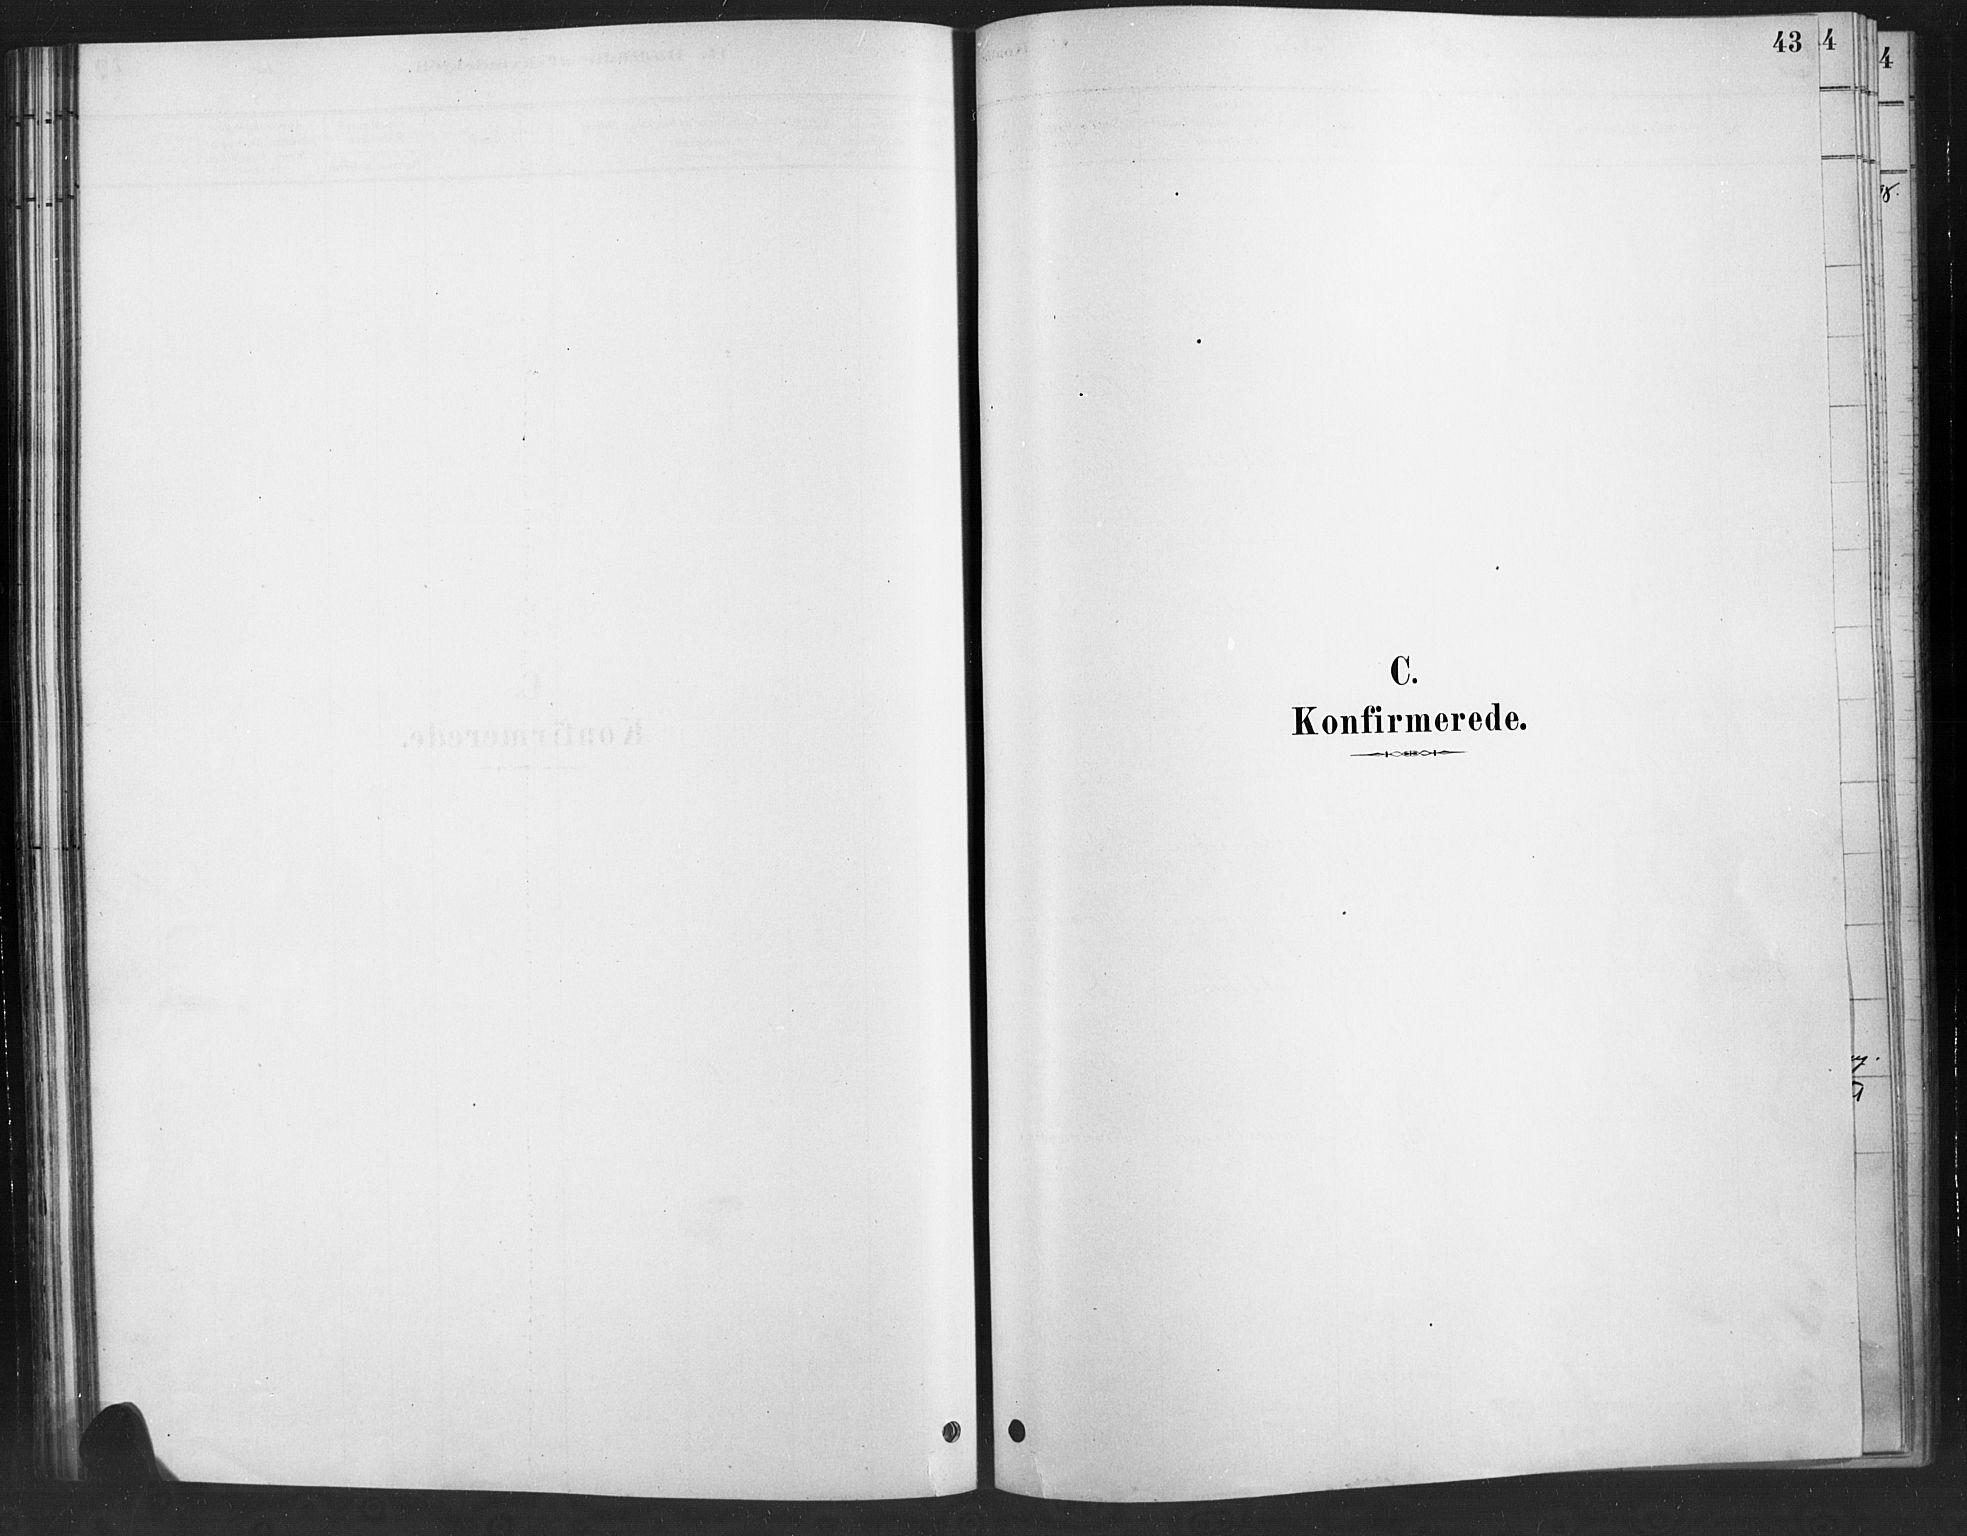 SAH, Ringebu prestekontor, Ministerialbok nr. 10, 1878-1898, s. 43